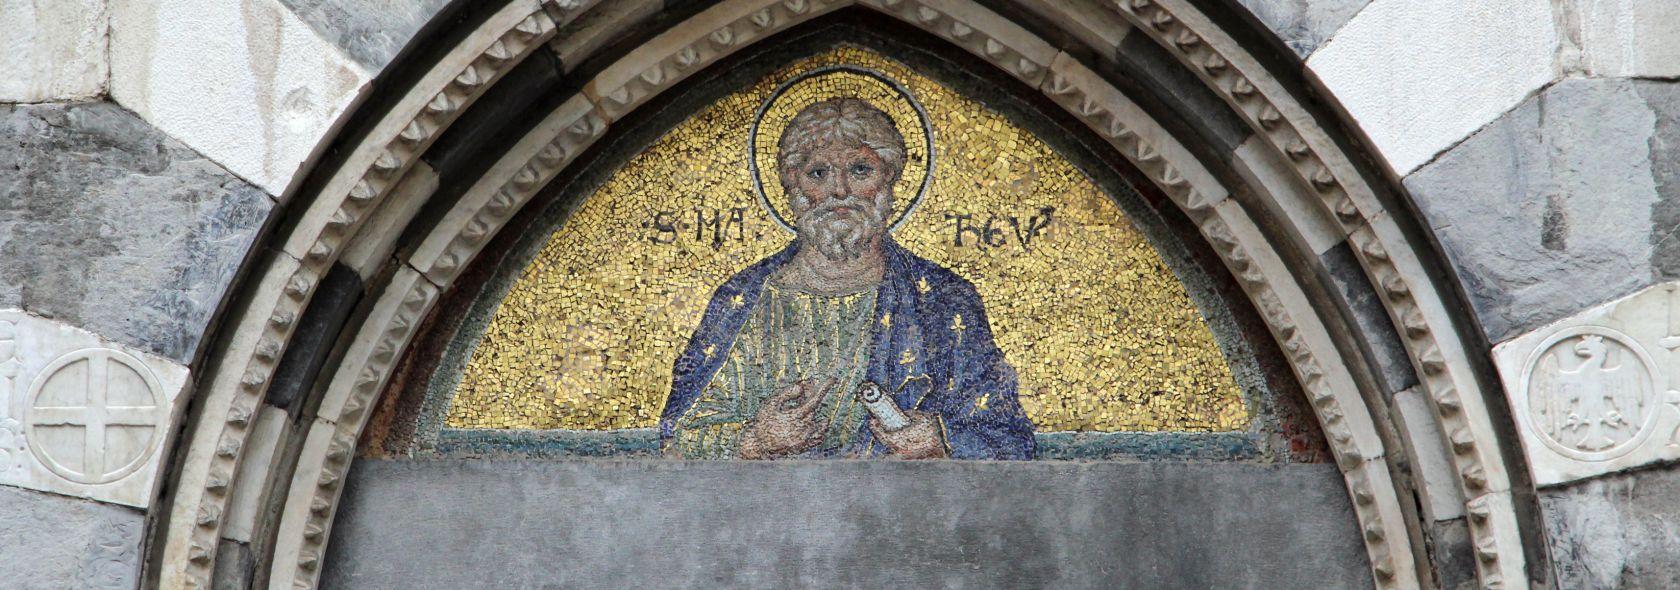 San Matteo, lunetta a mosaico con San Matteo